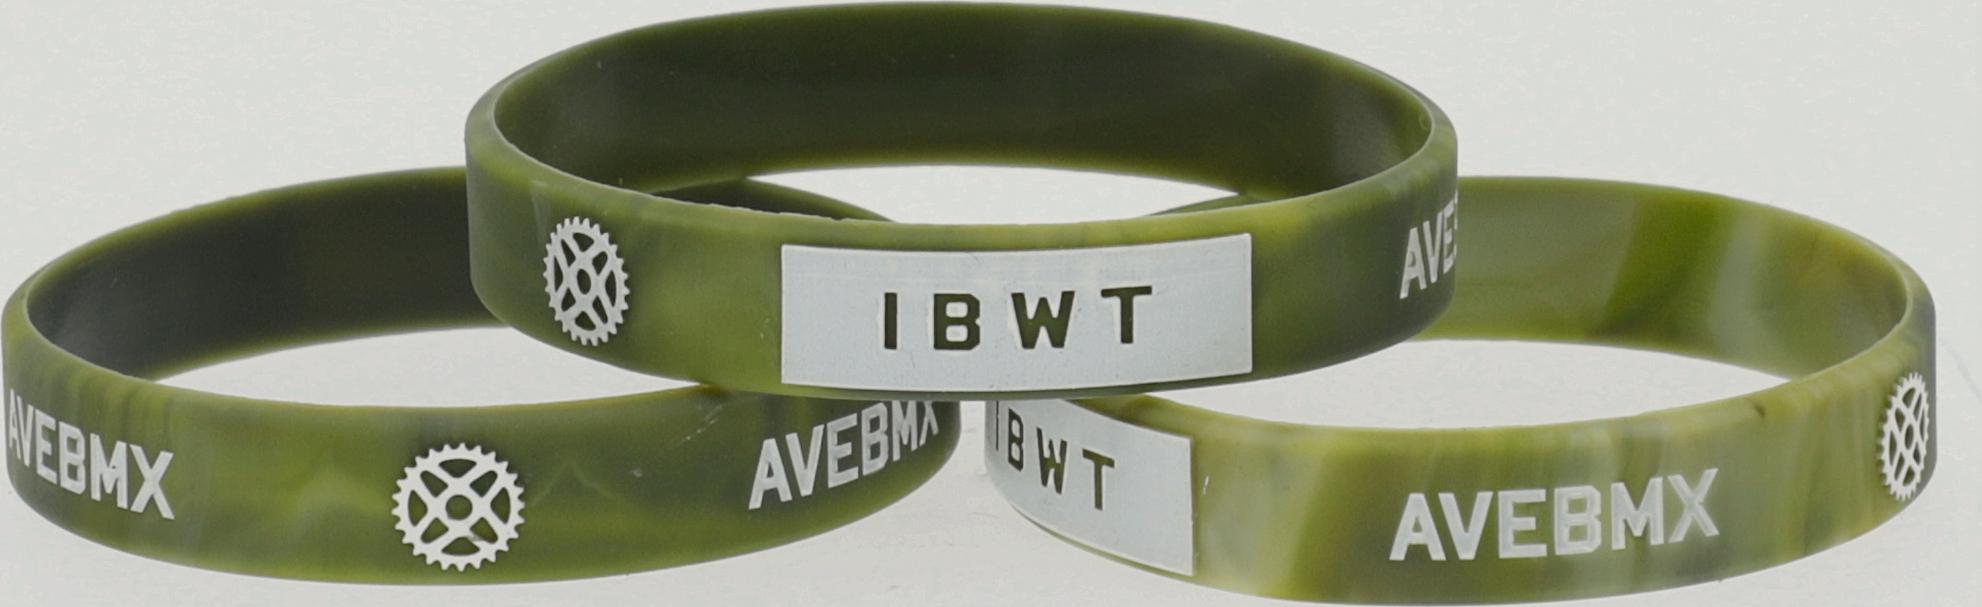 Opaska Ave BMX IBWT Green Camo